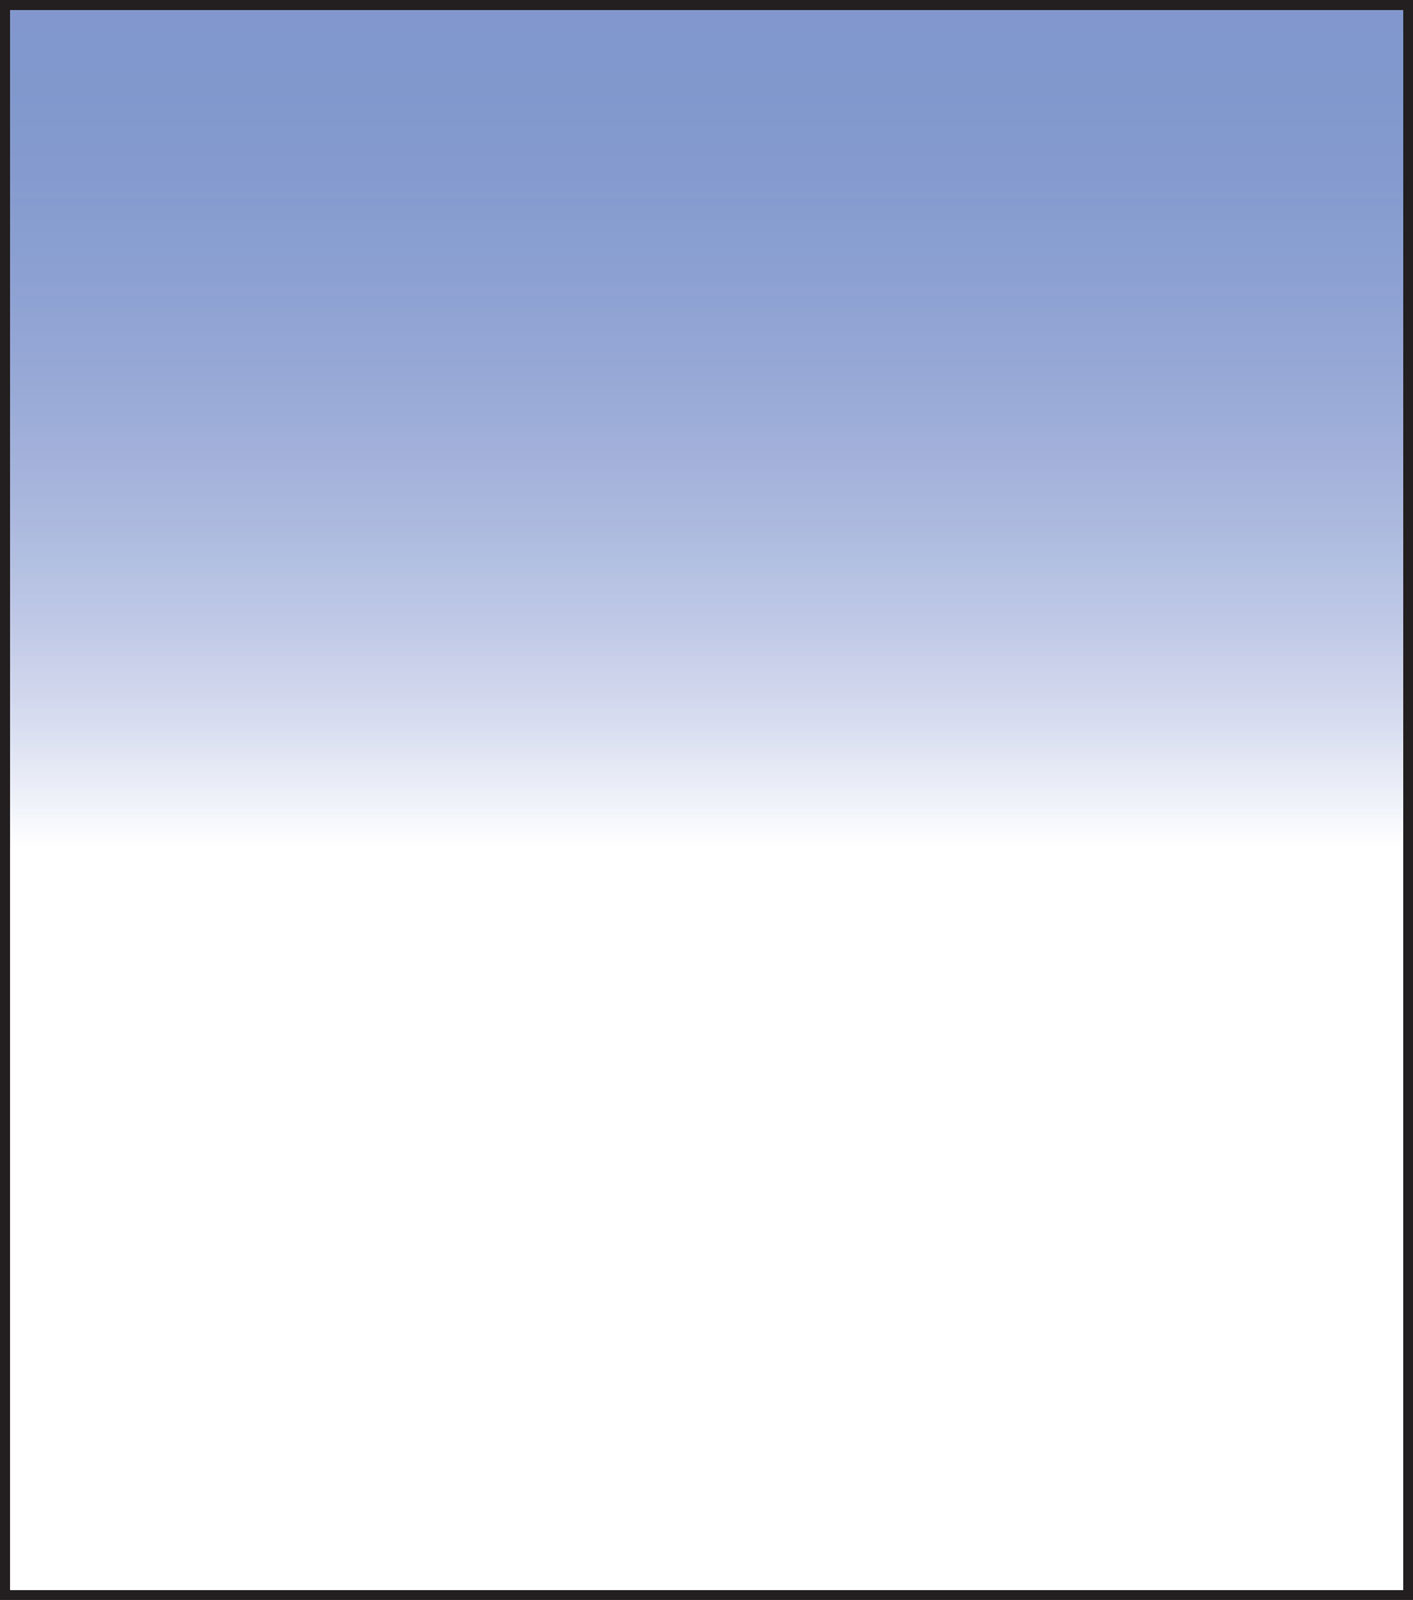 SW150-Real-Blue-2-Hard-Grad